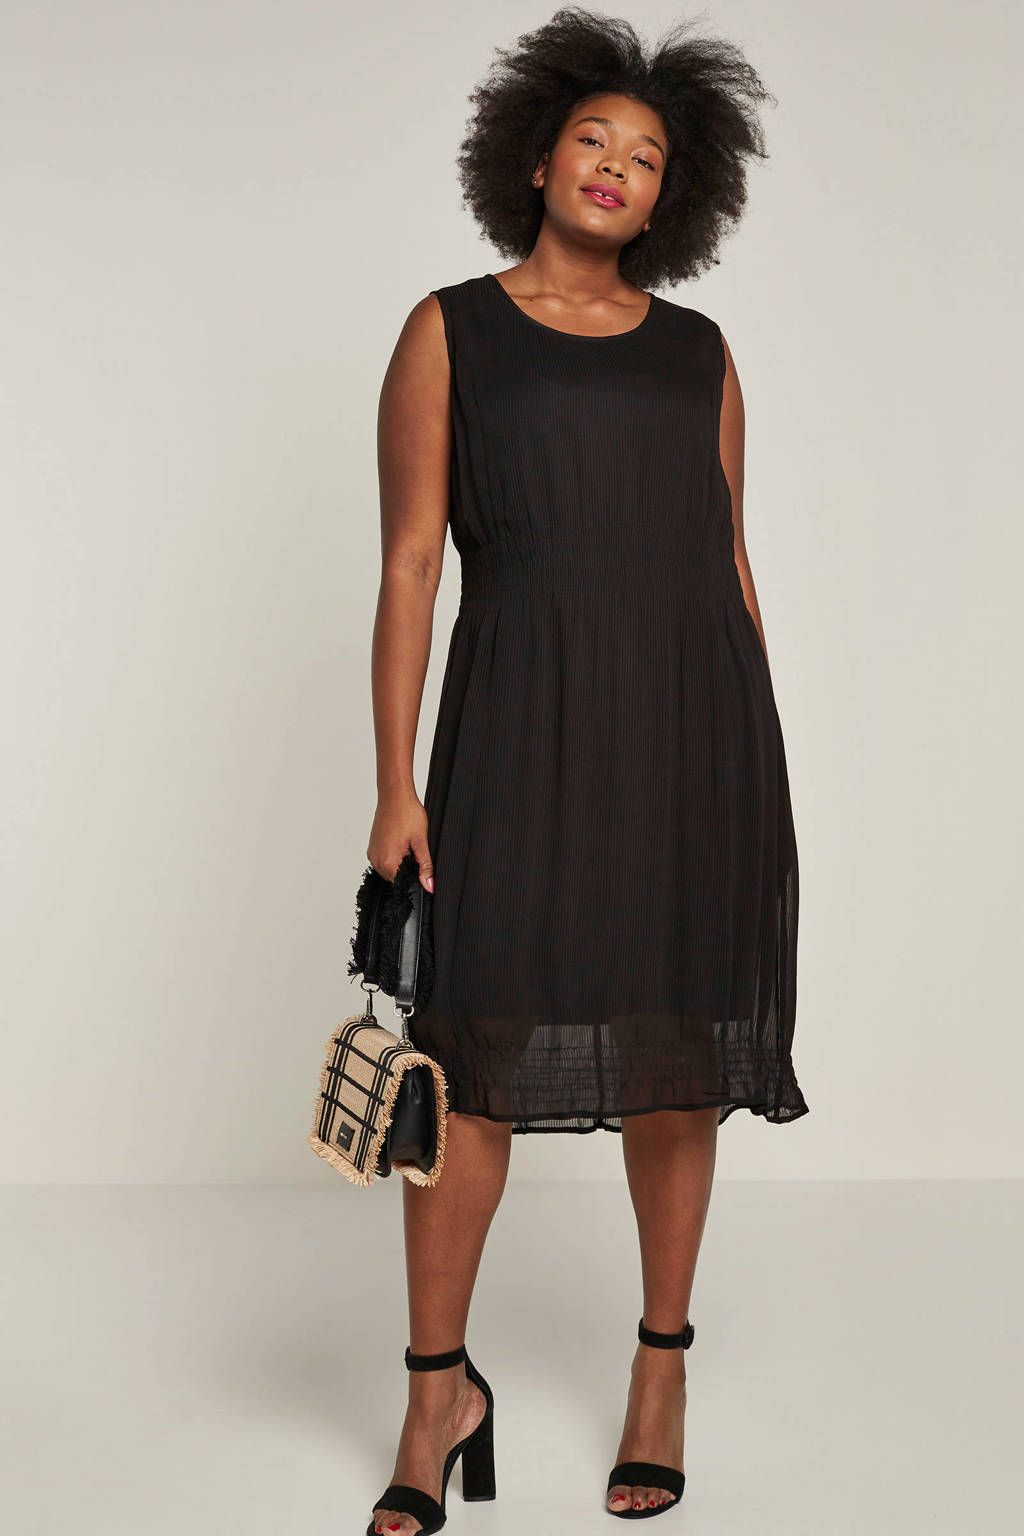 CHOISE jurk zwart, Zwart